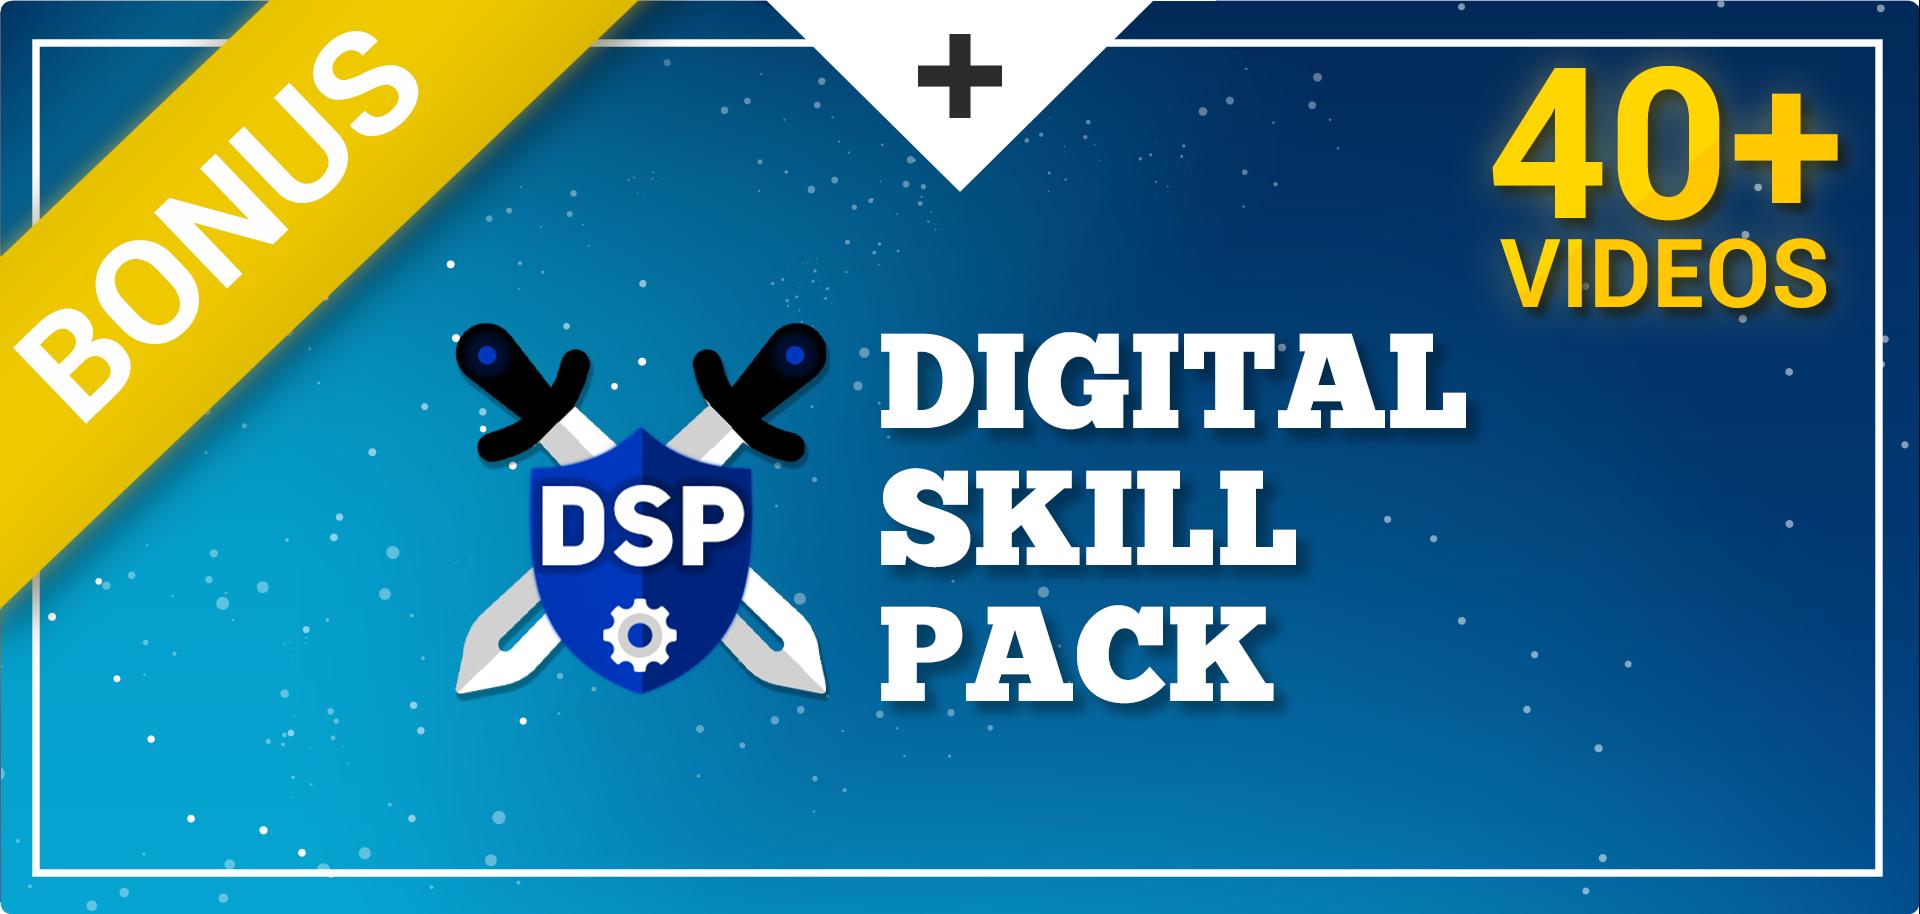 DMM - Running A Digital Marketing Agency Guide